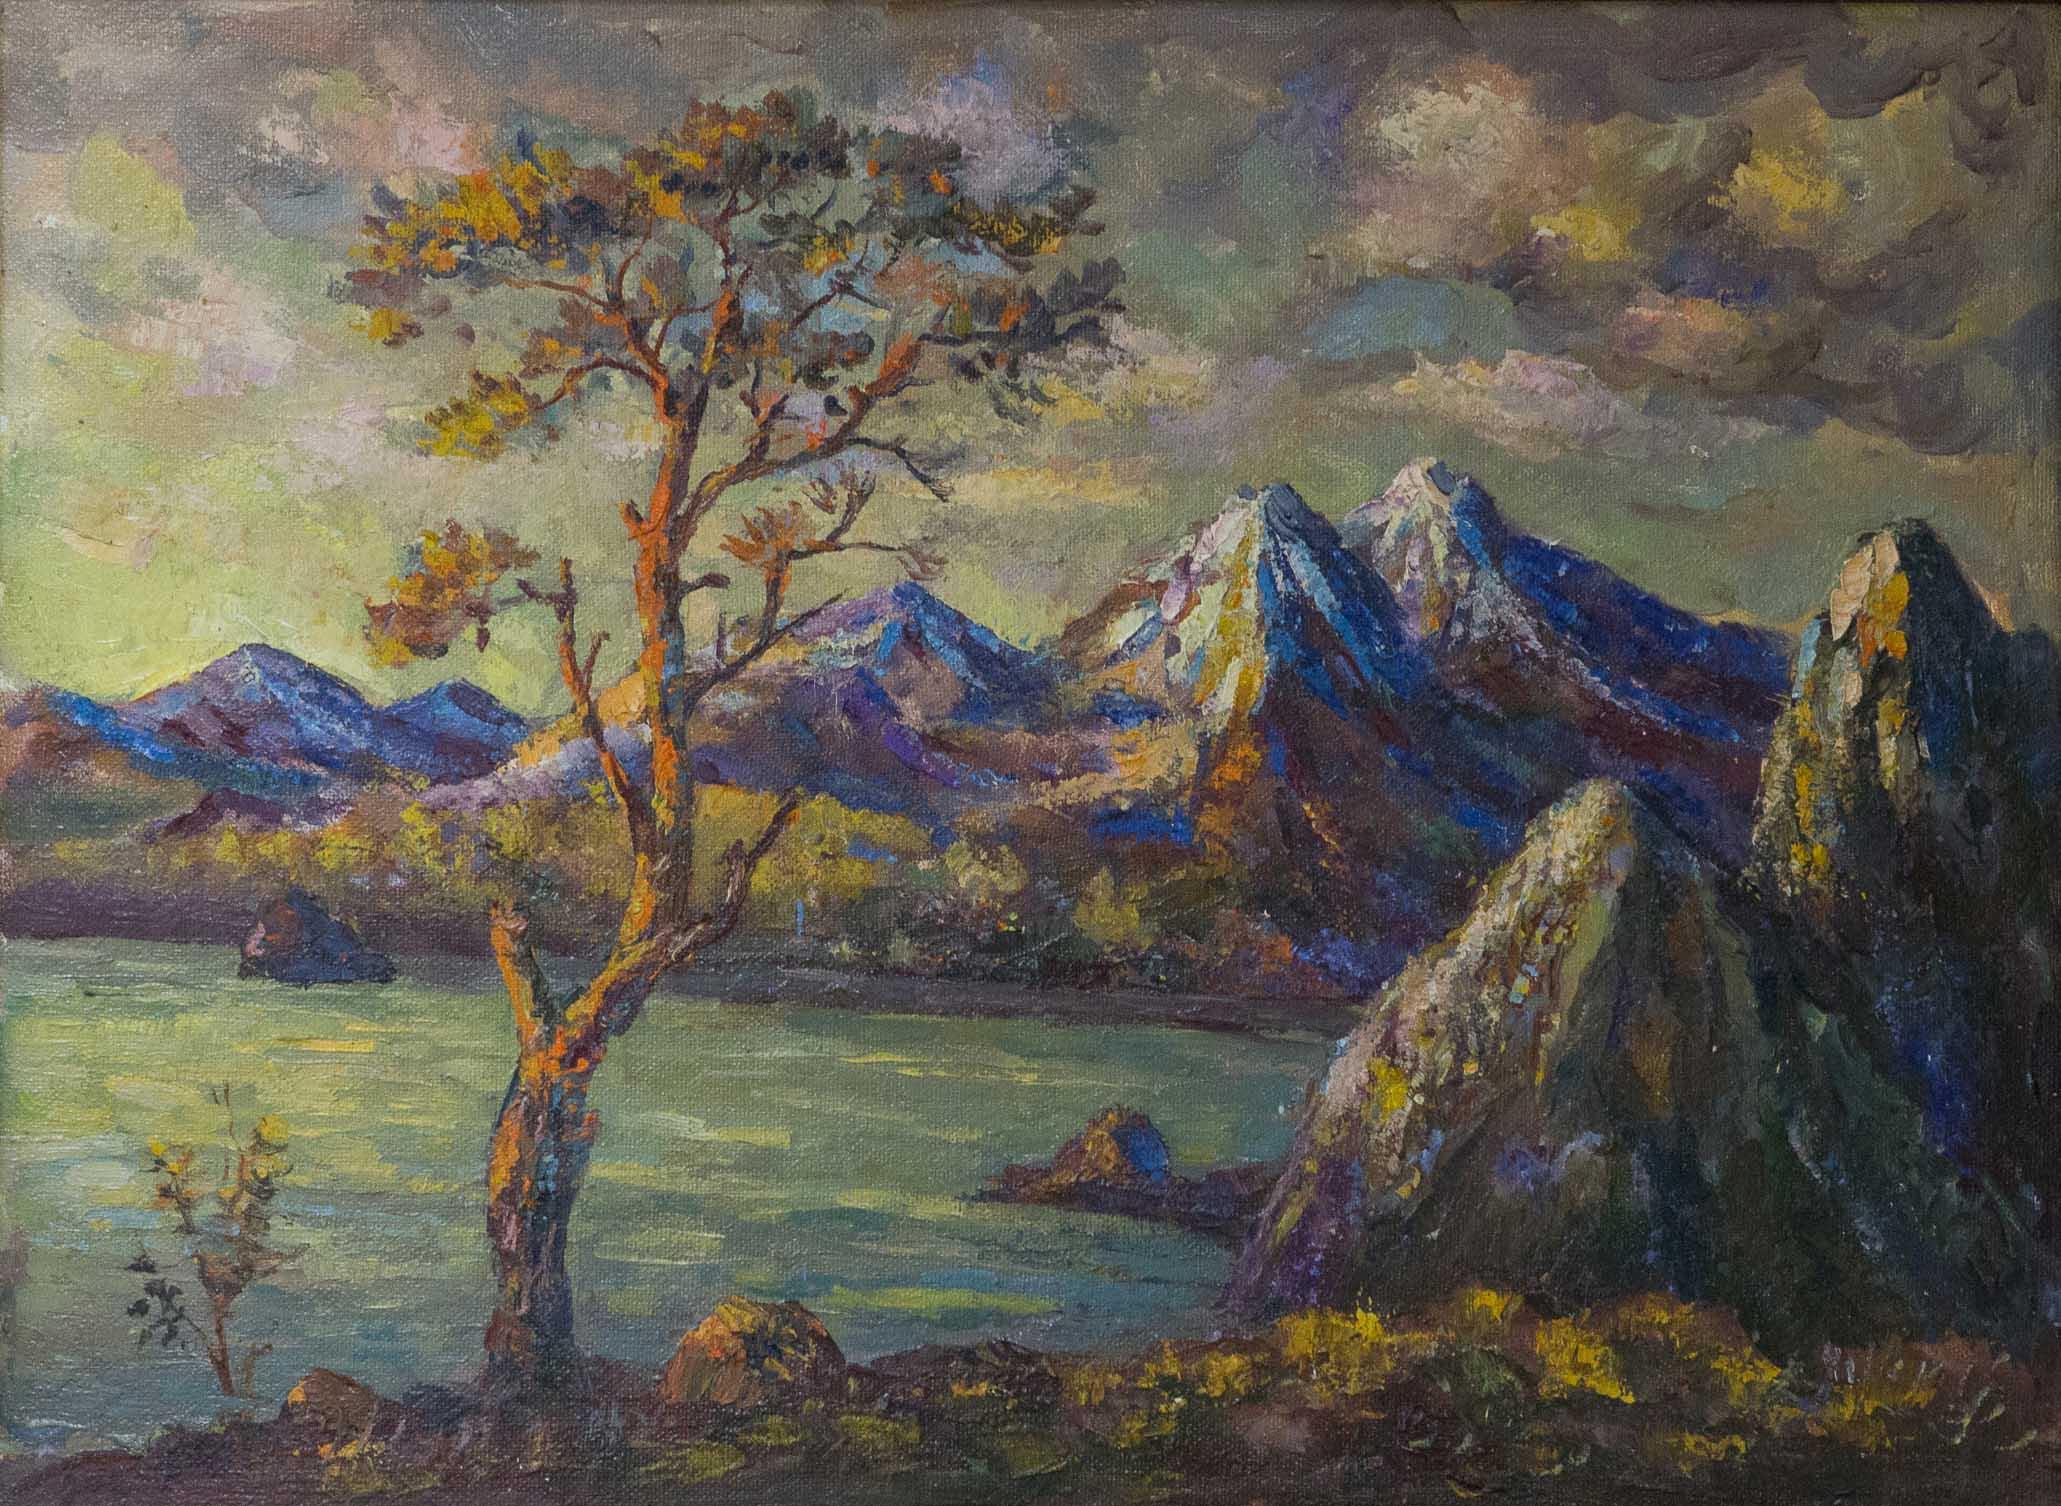 www.dmitry-malyshev.com